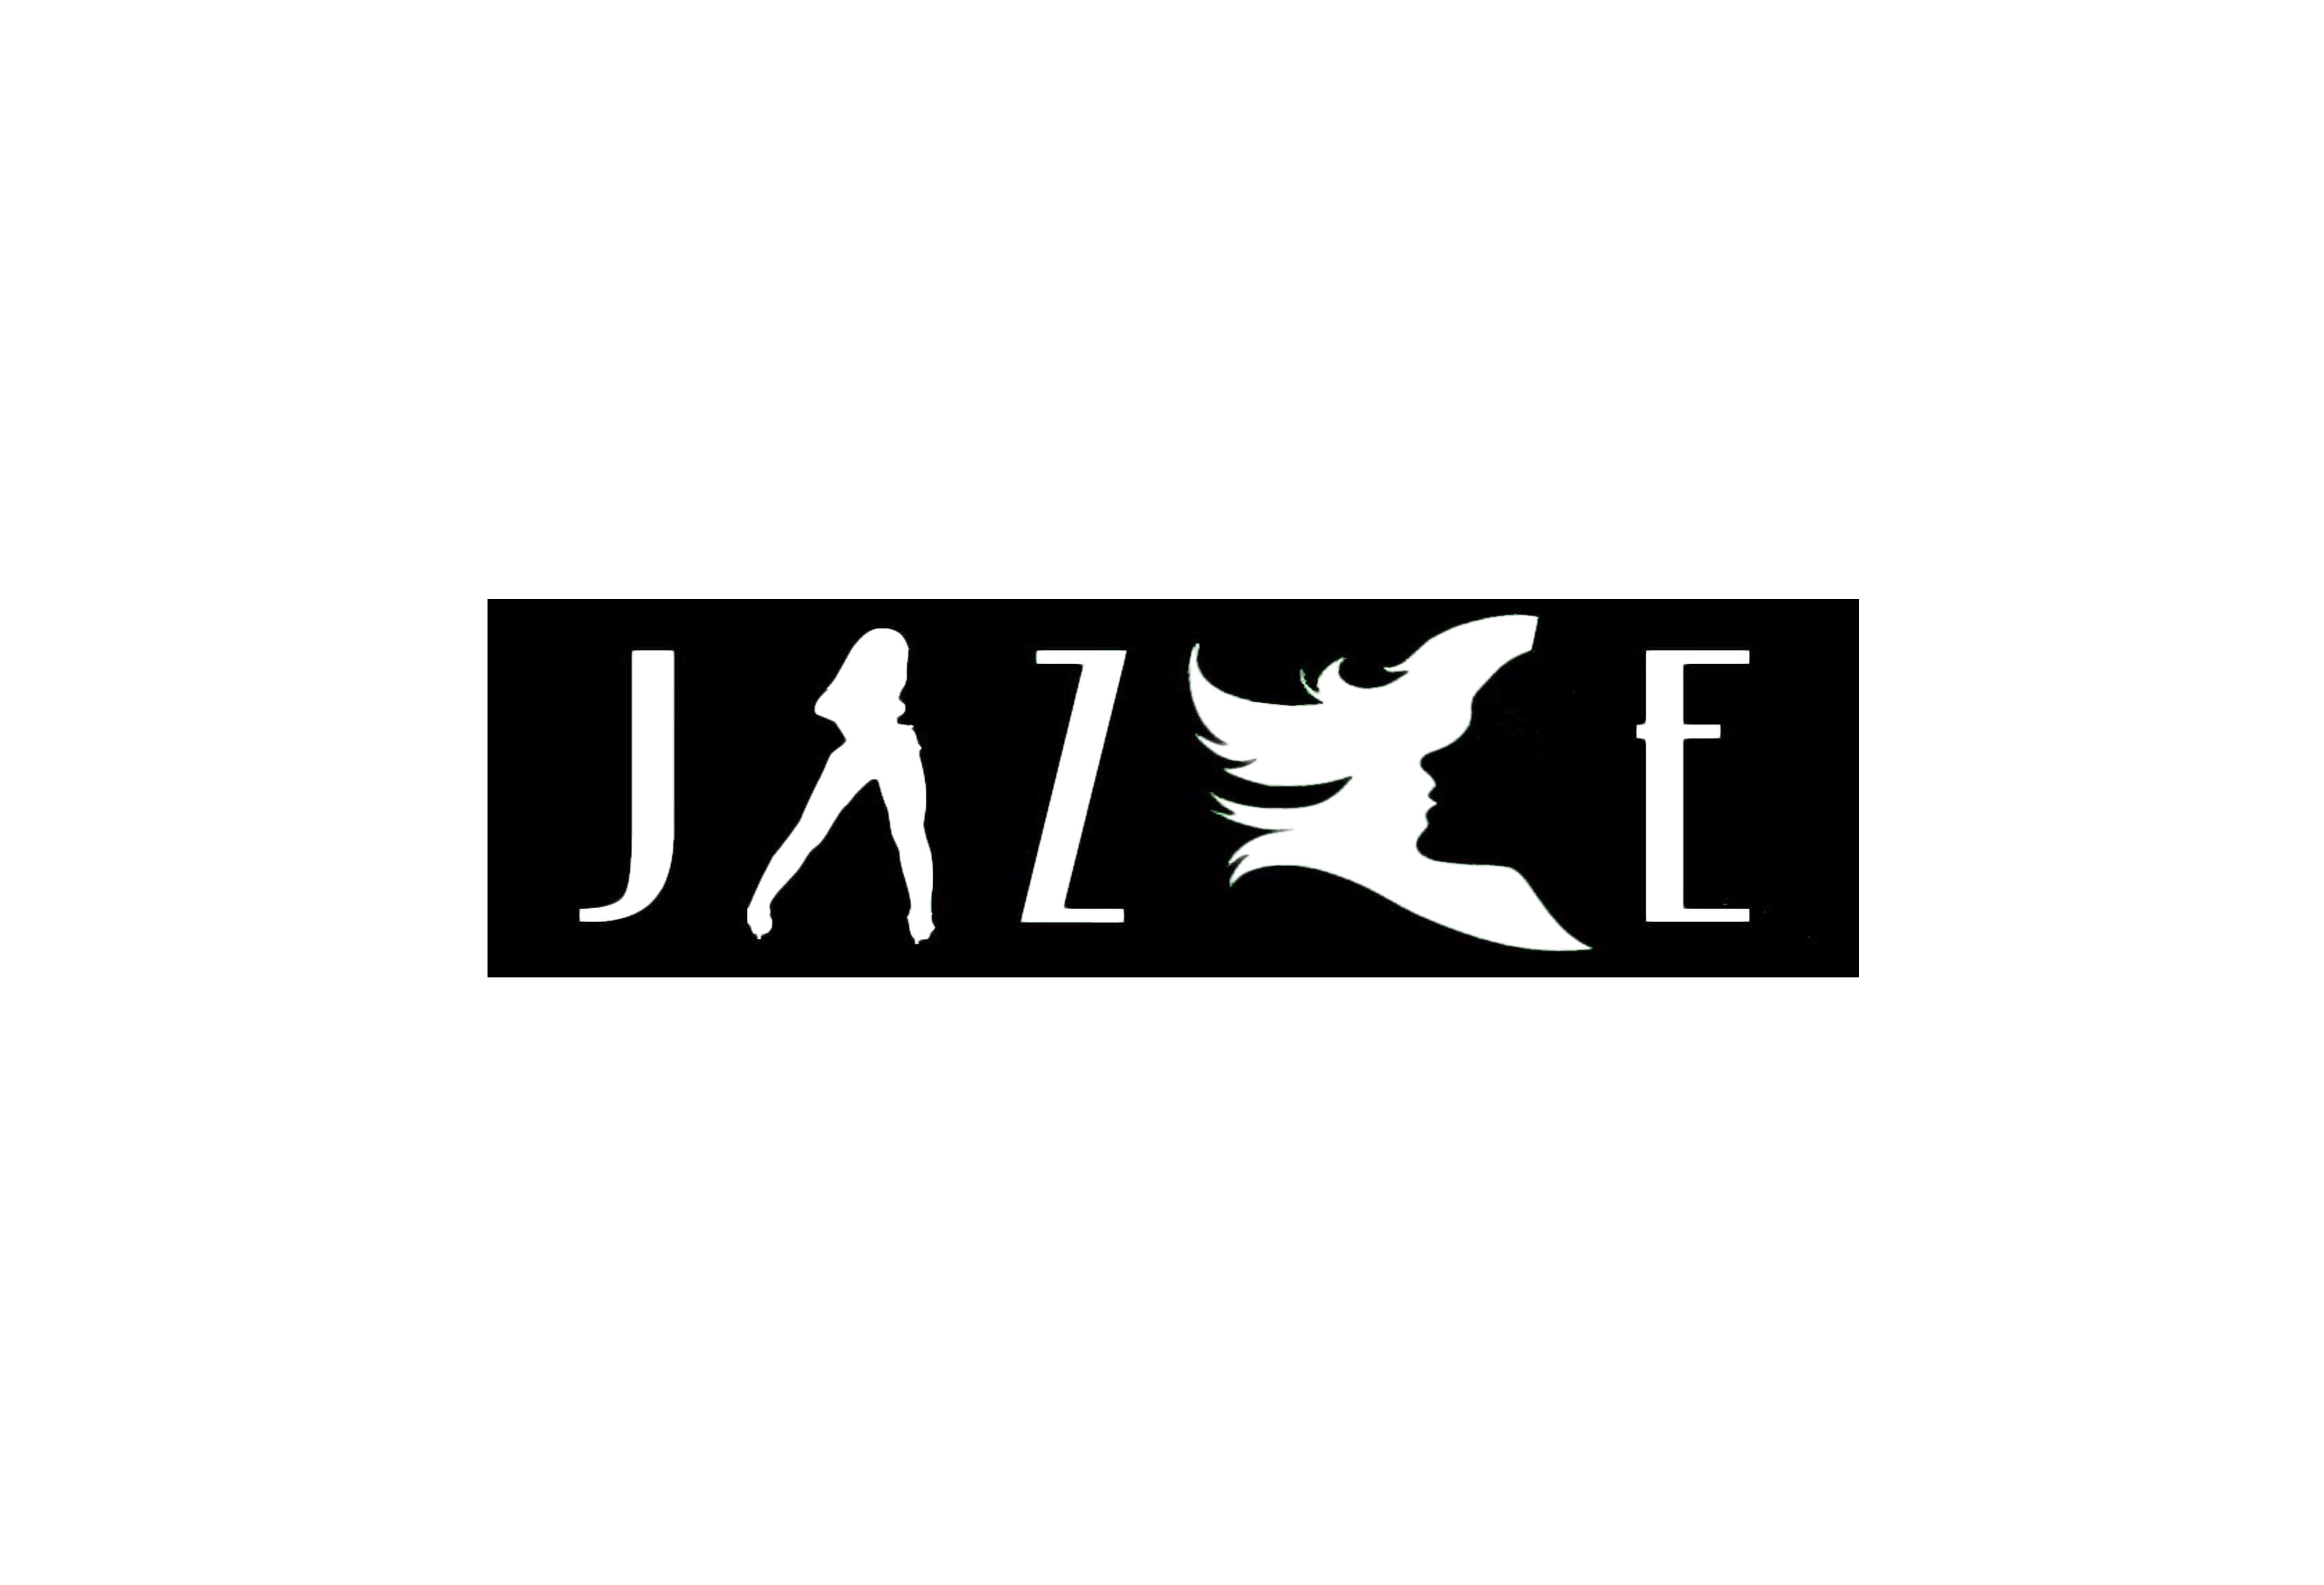 Jazee Hair - ad image